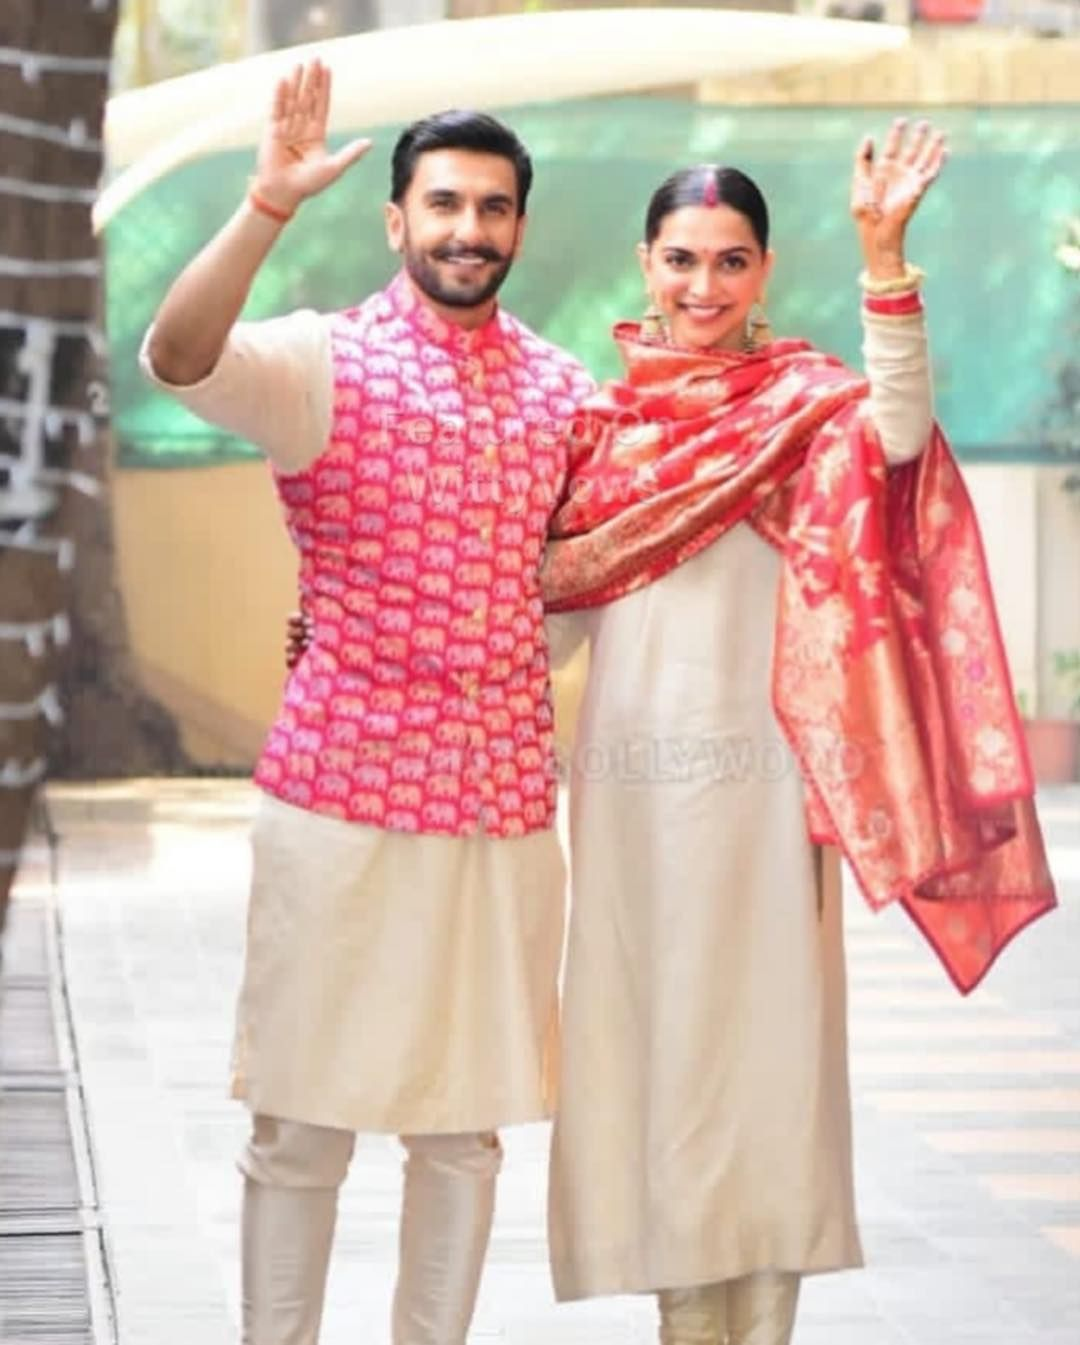 Deepika Padukone And Ranveer Singh Wedding Deepveer Wedding Bride And Groom In Sabyasachi Mukher Indian Wedding Outfits Bollywood Wedding Pakistani Outfits